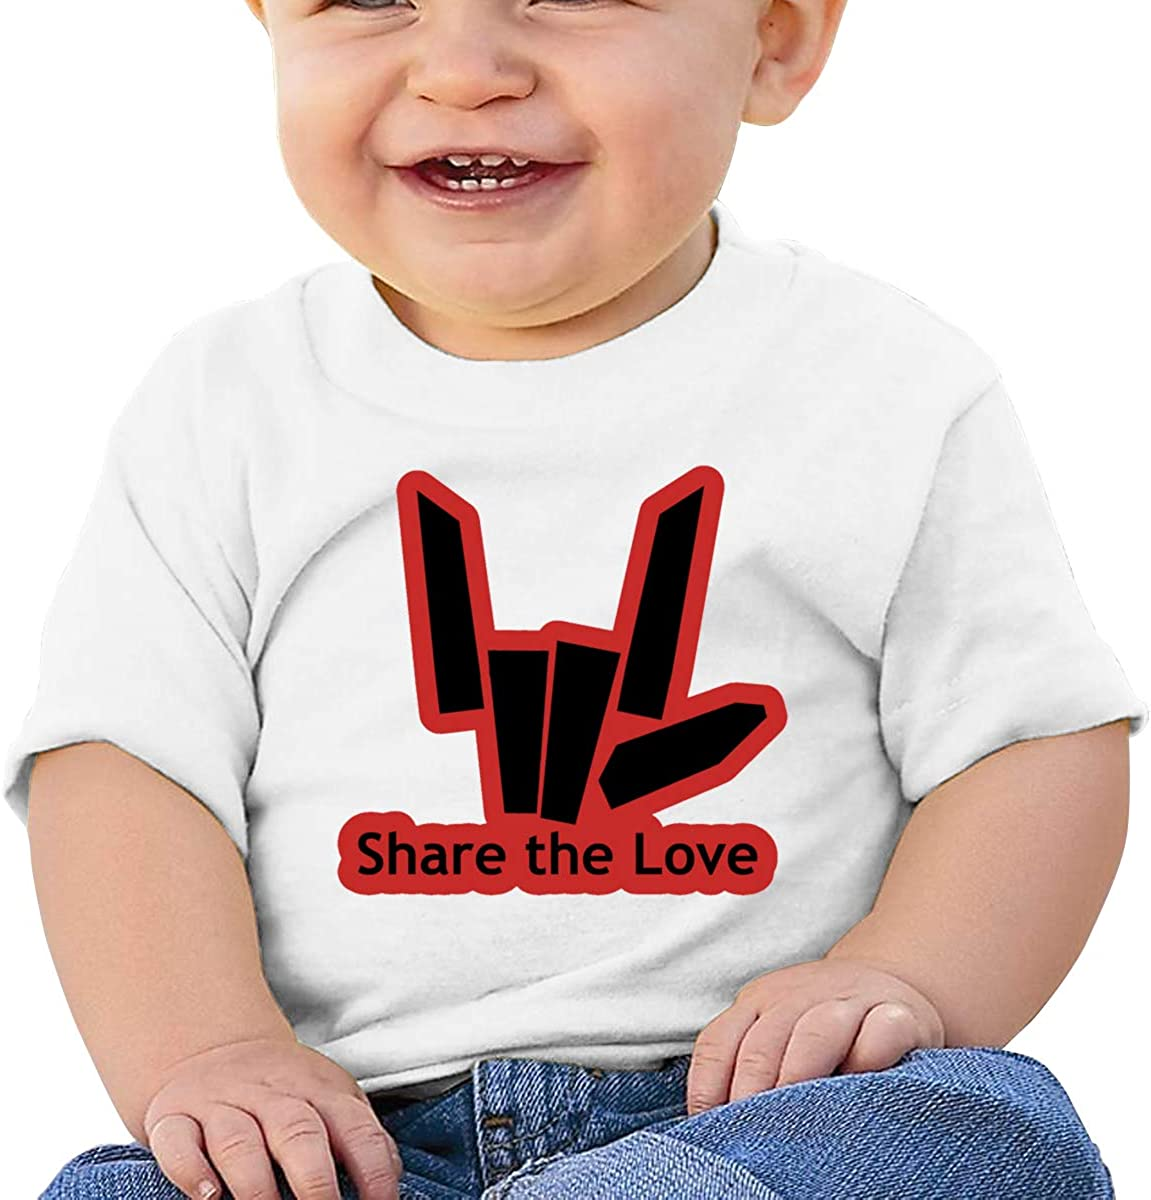 Zippem Share The Love Logo Short Sleeve T-Shirt Best for Baby Toddler//Infant Kids T-Shirt Close Skin Soft